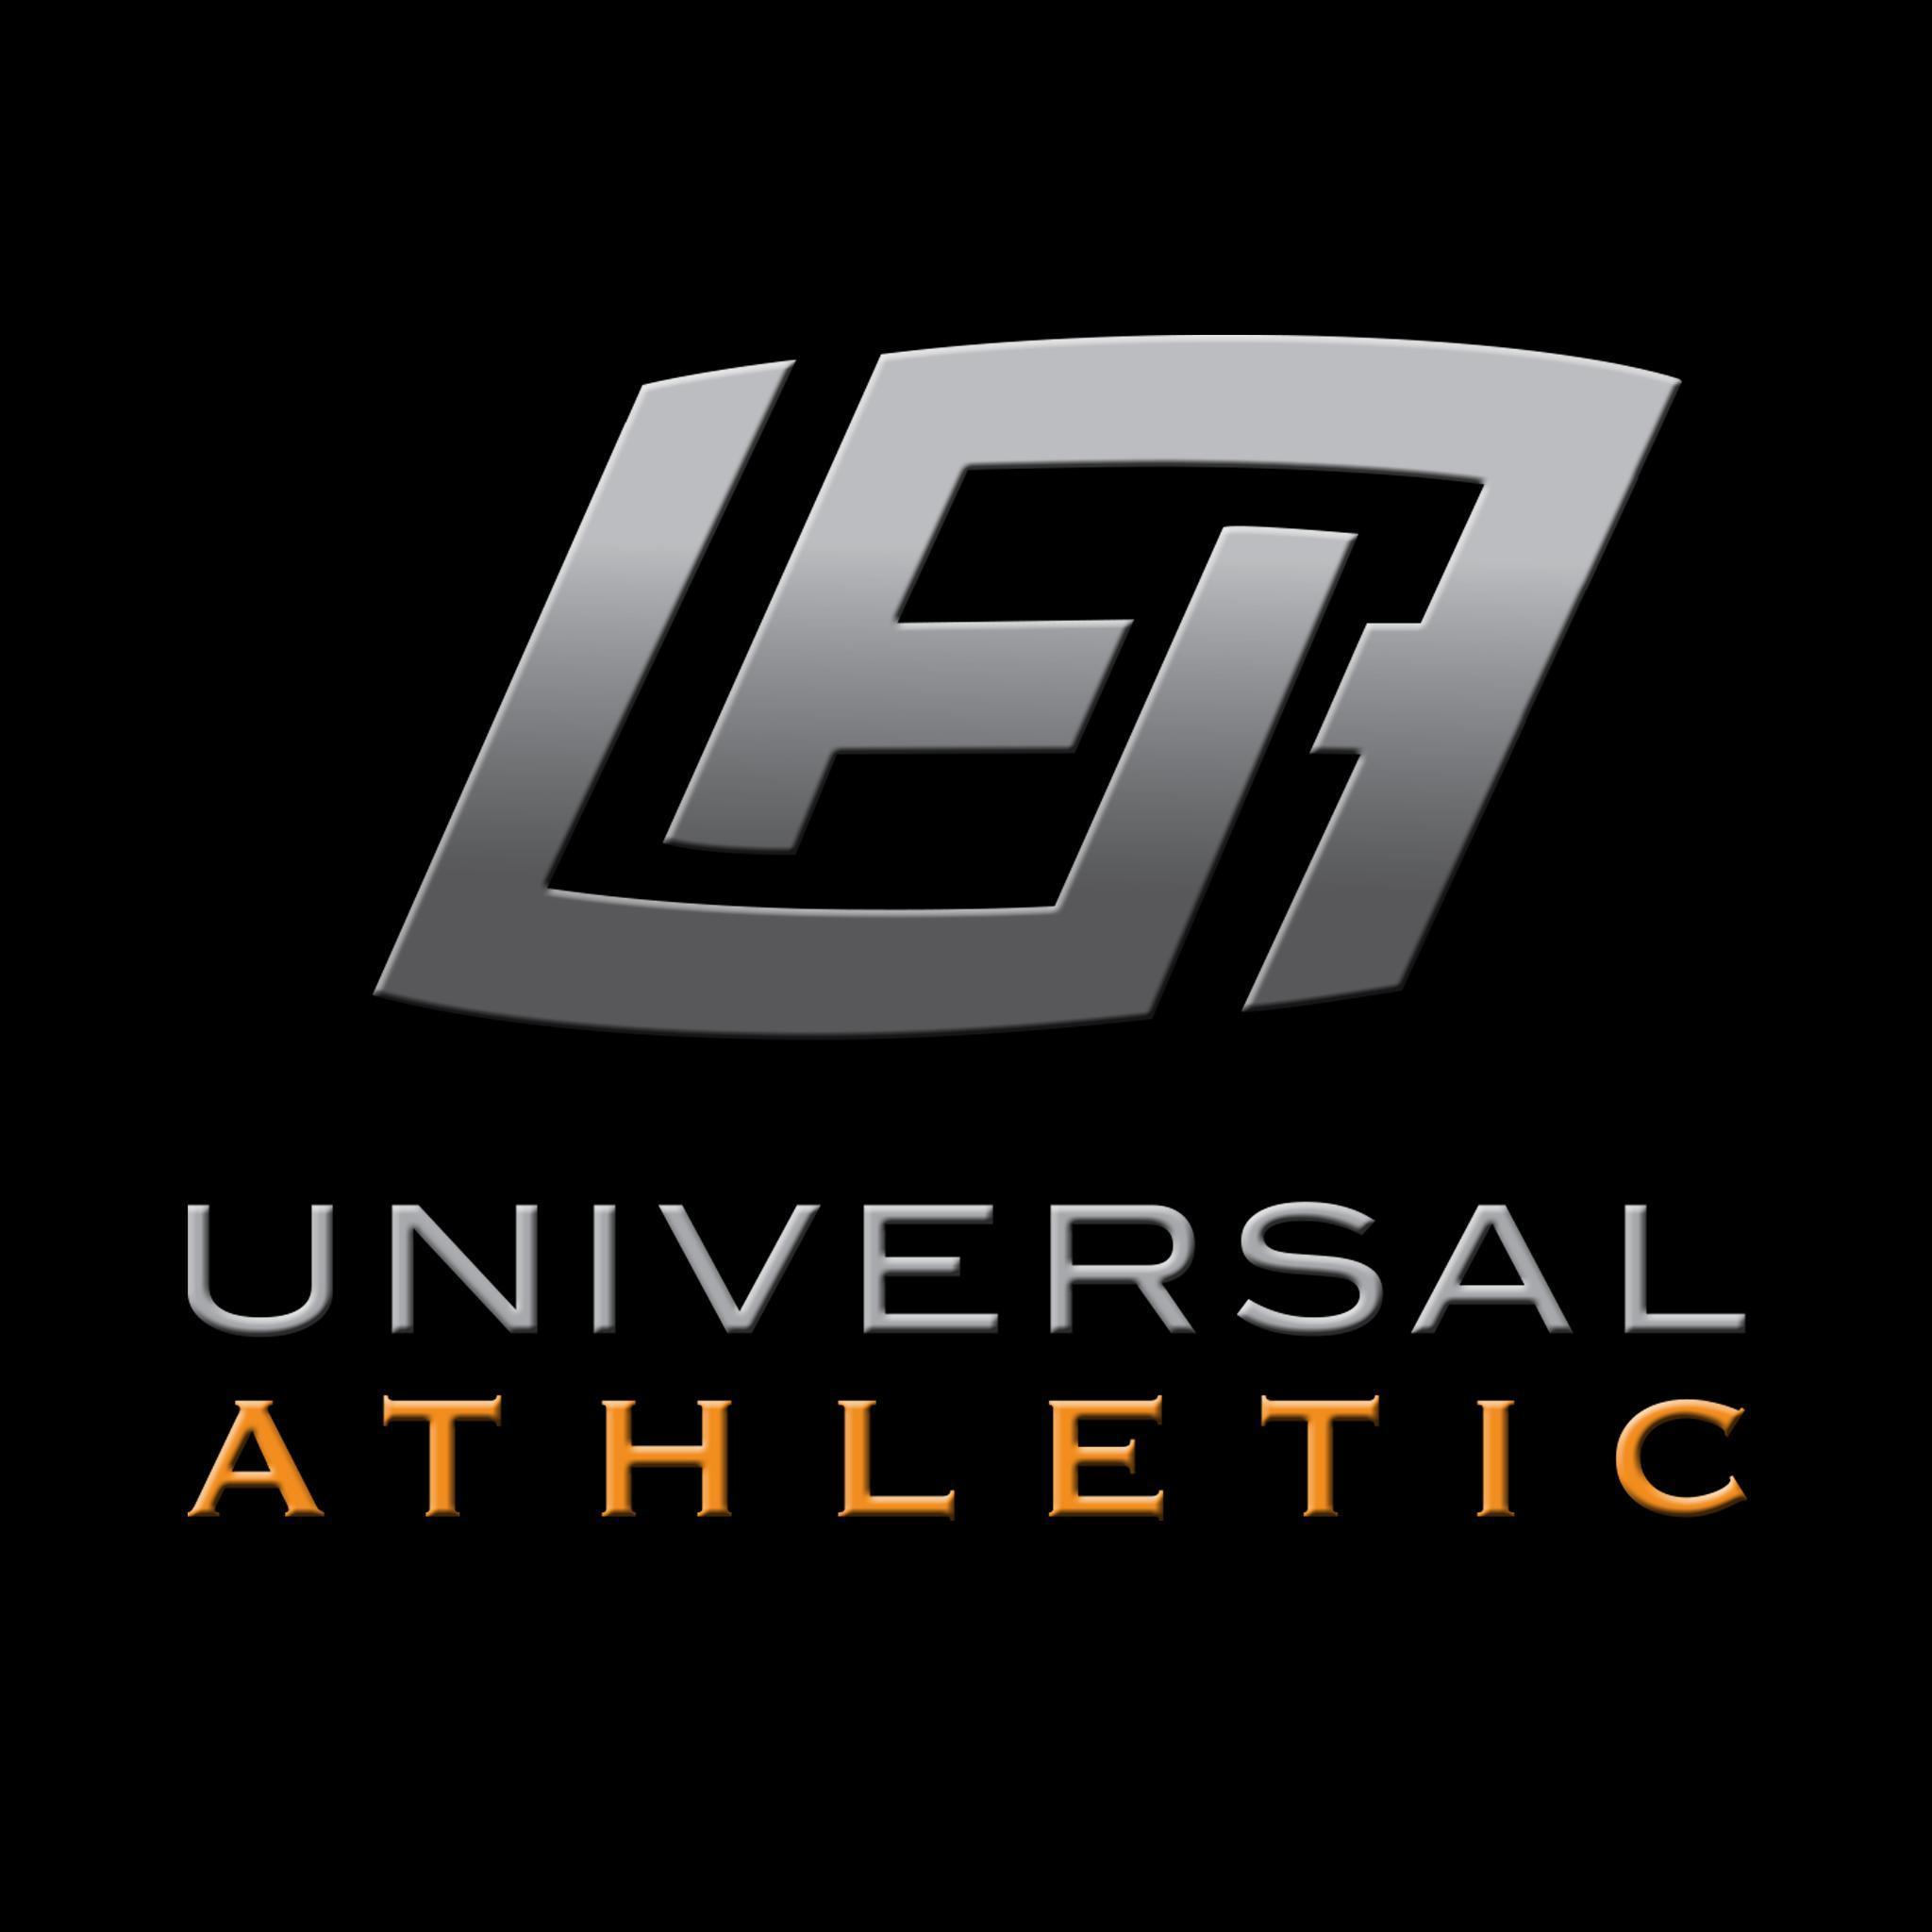 Universal Athletic logo